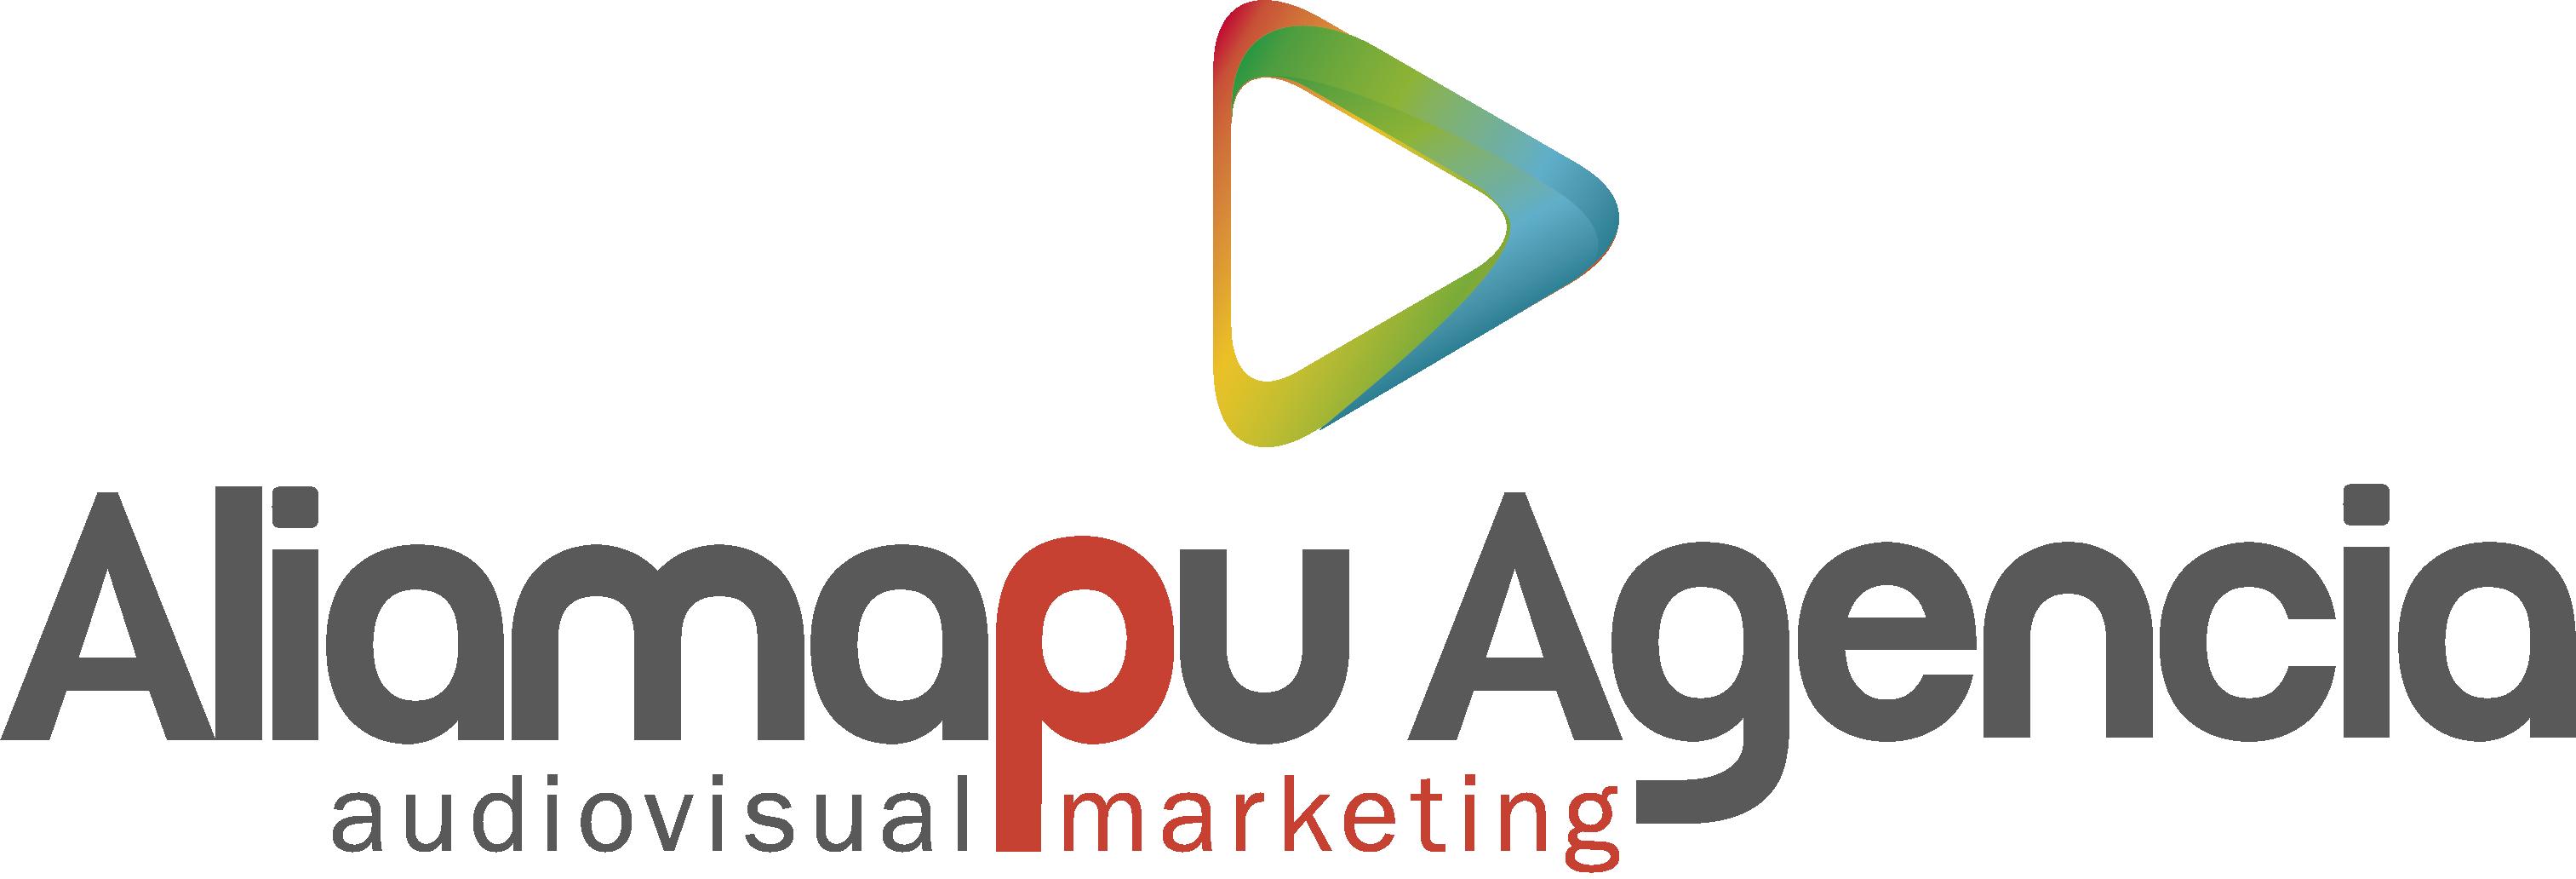 Aliamapu Agencia